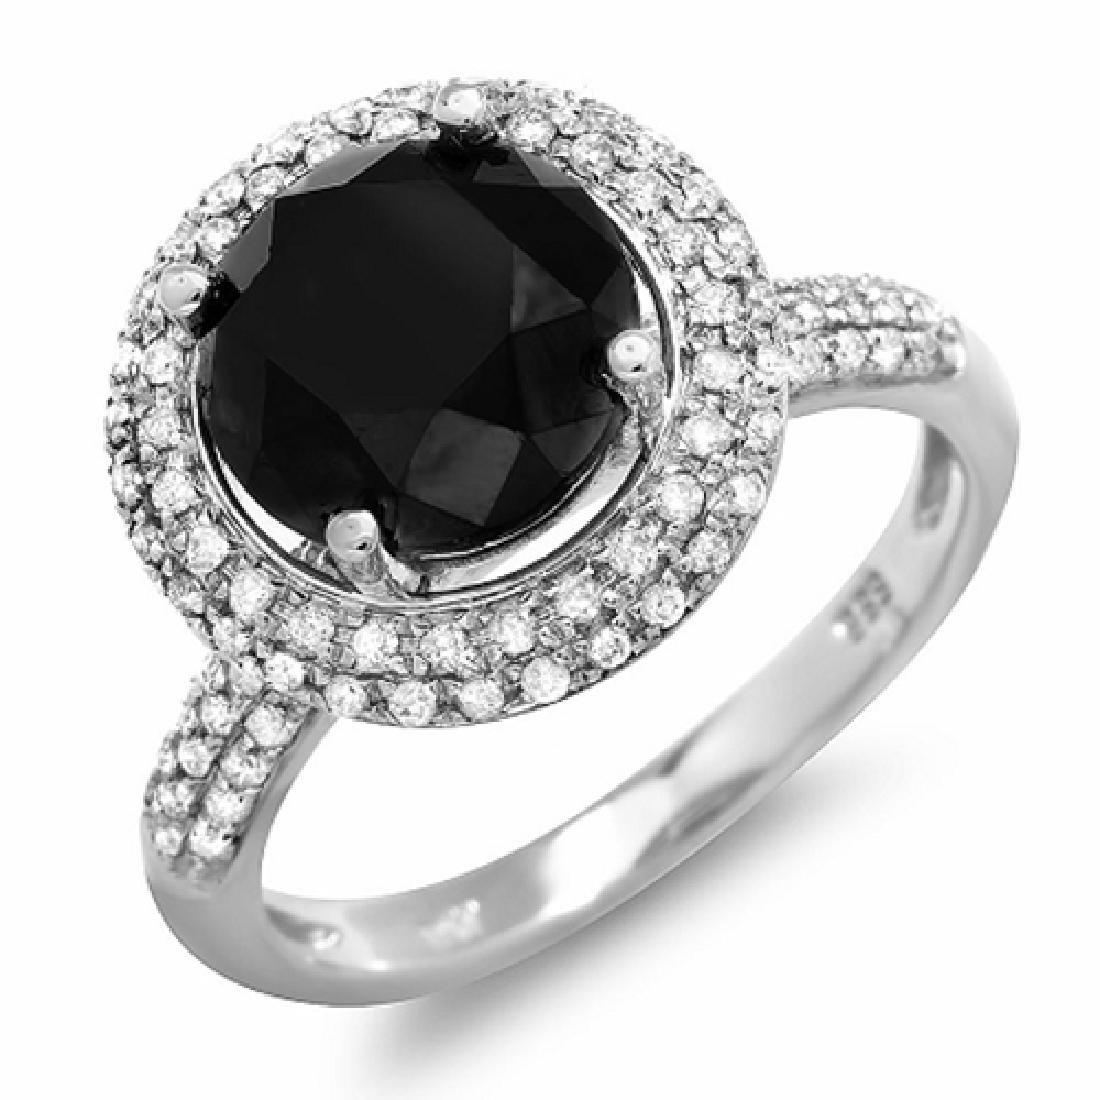 4.64 Carat Natural Diamond 18K Solid White Gold Ring